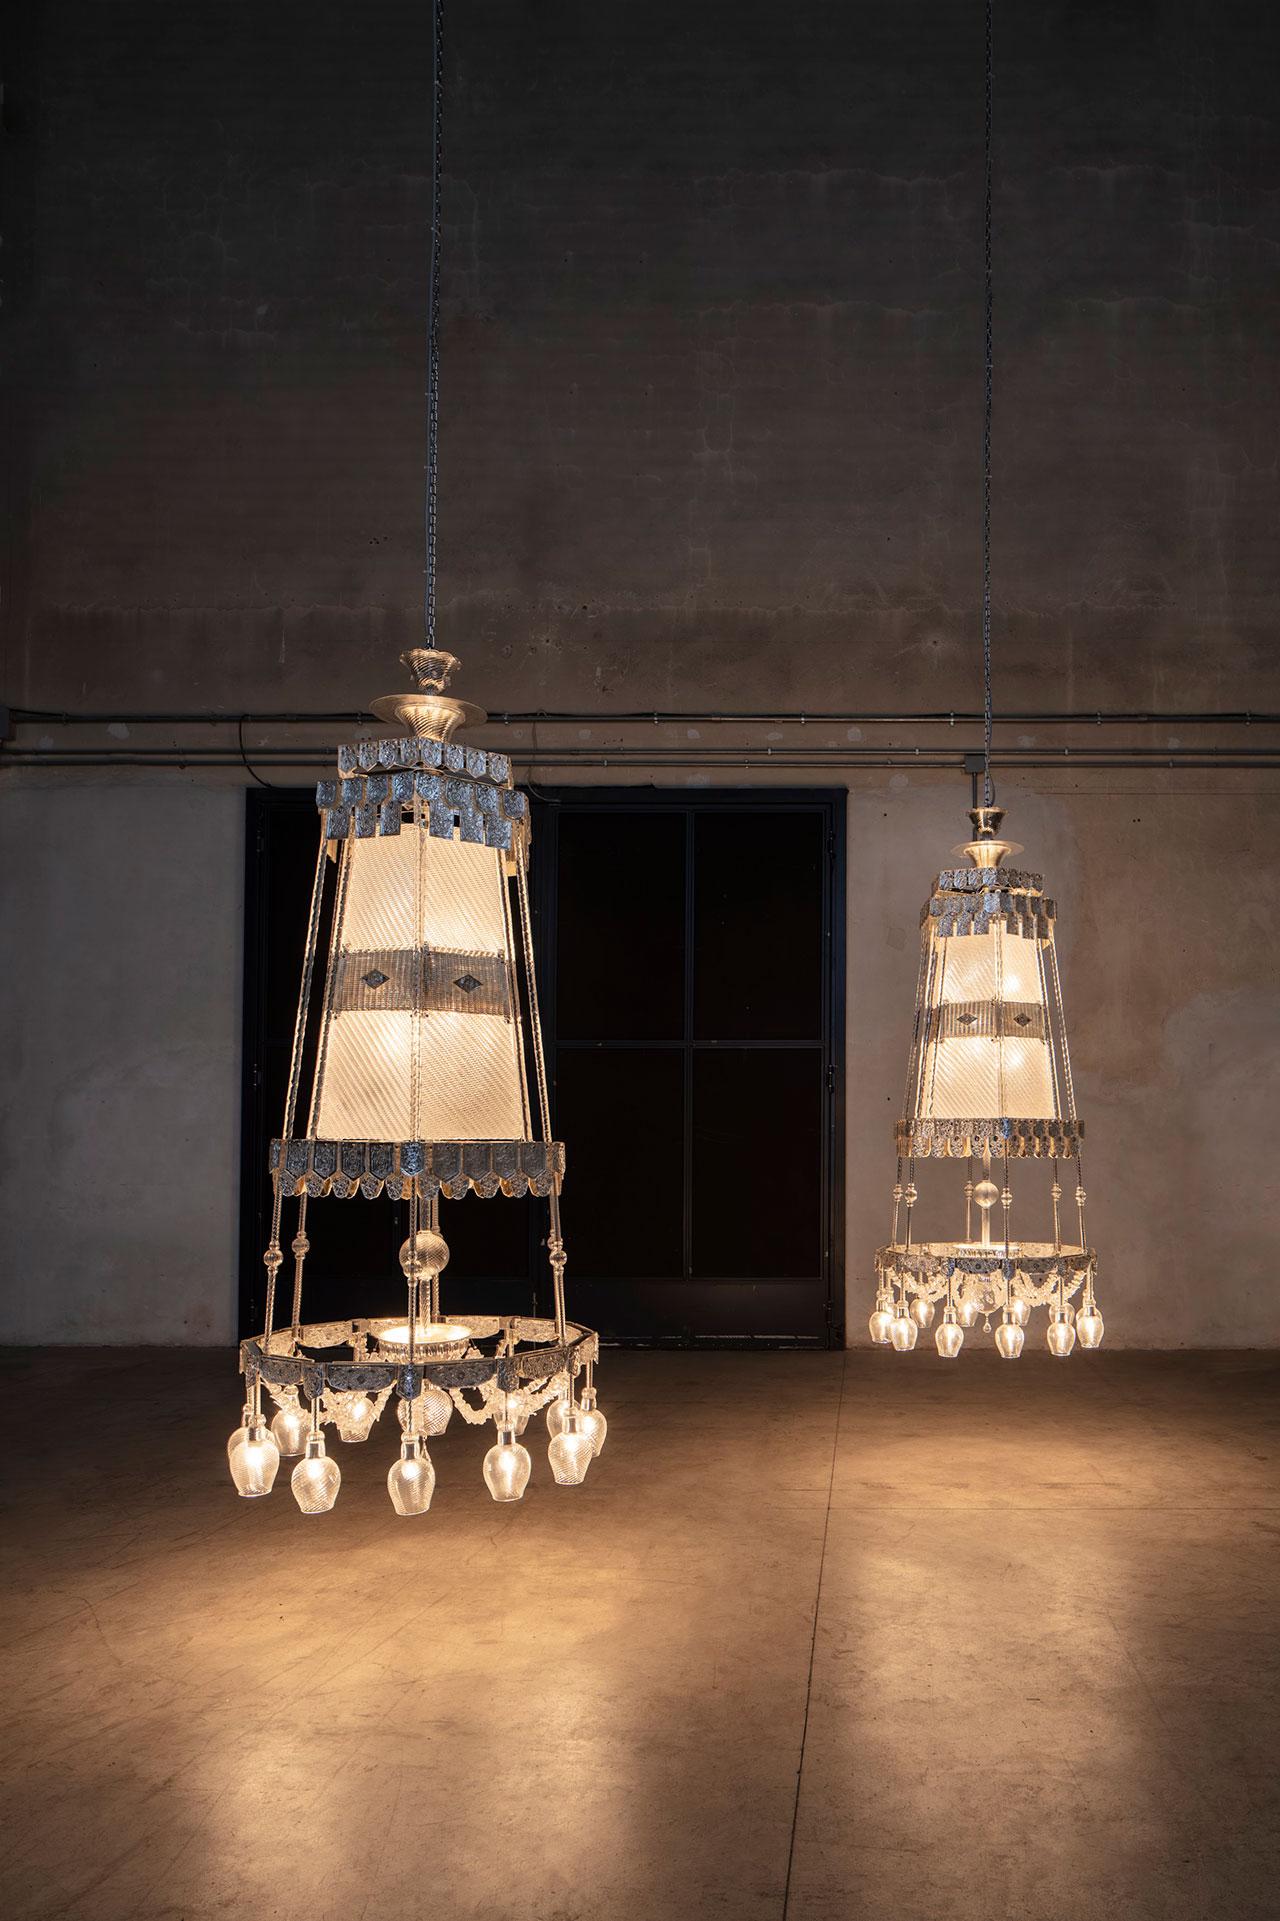 Cerith Wyn Evans, S=U=T=R=A, 2017. Installation view at Pirelli HangarBicocca, Milan, 2019. Courtesy of the artist; Marian Goodman Gallery, New York, Paris and London, and Pirelli HangarBicocca. Photo: Agostino Osio.